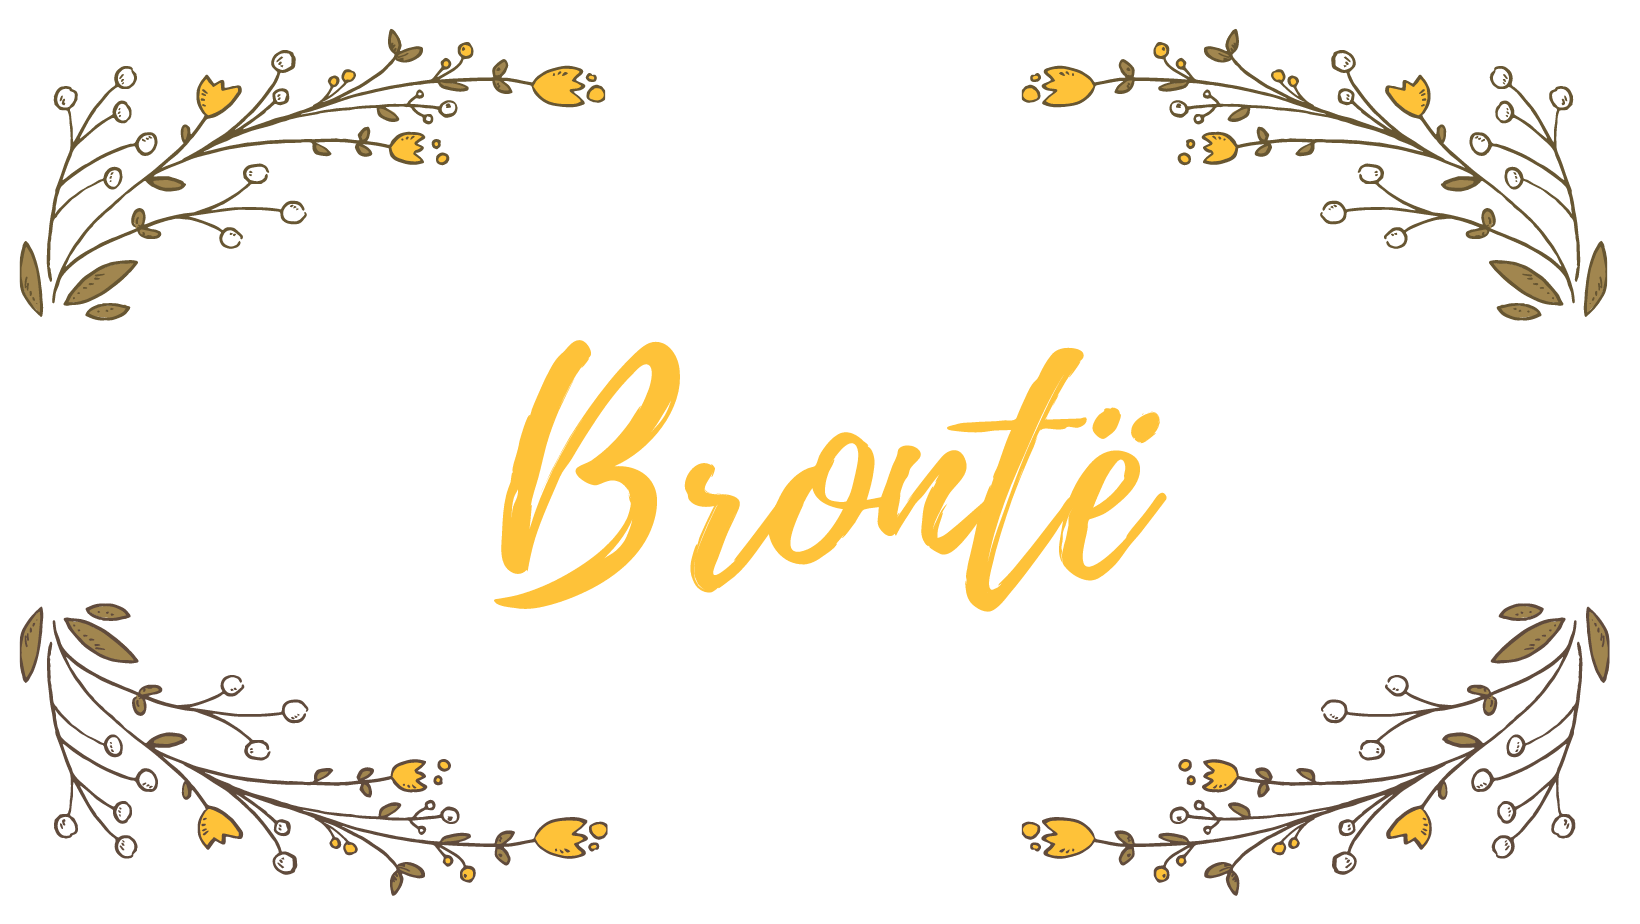 How to pronounce Brontë- a curious literay surname